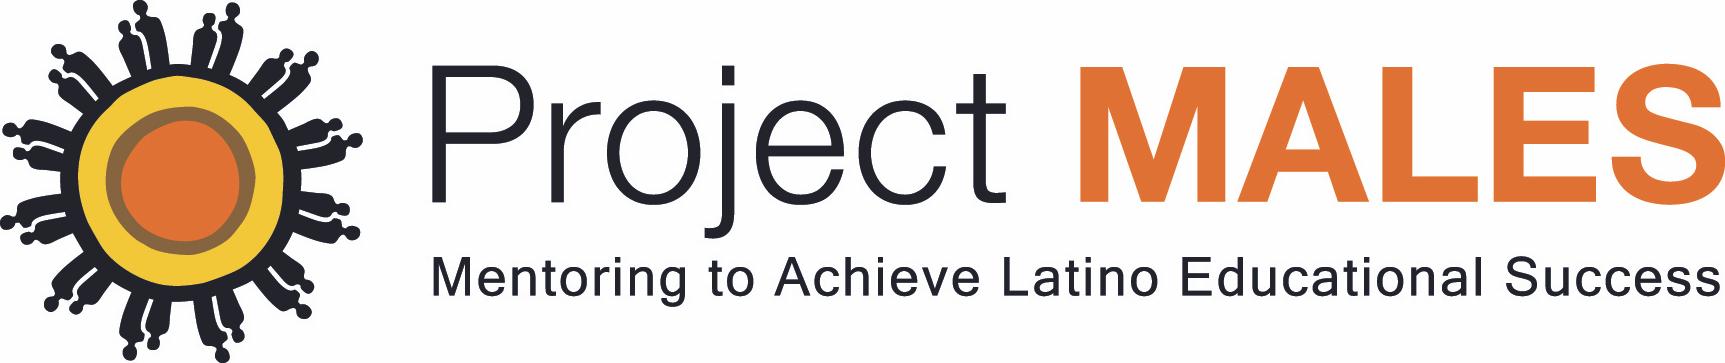 Responsive Menu Pro Header Bar Logo